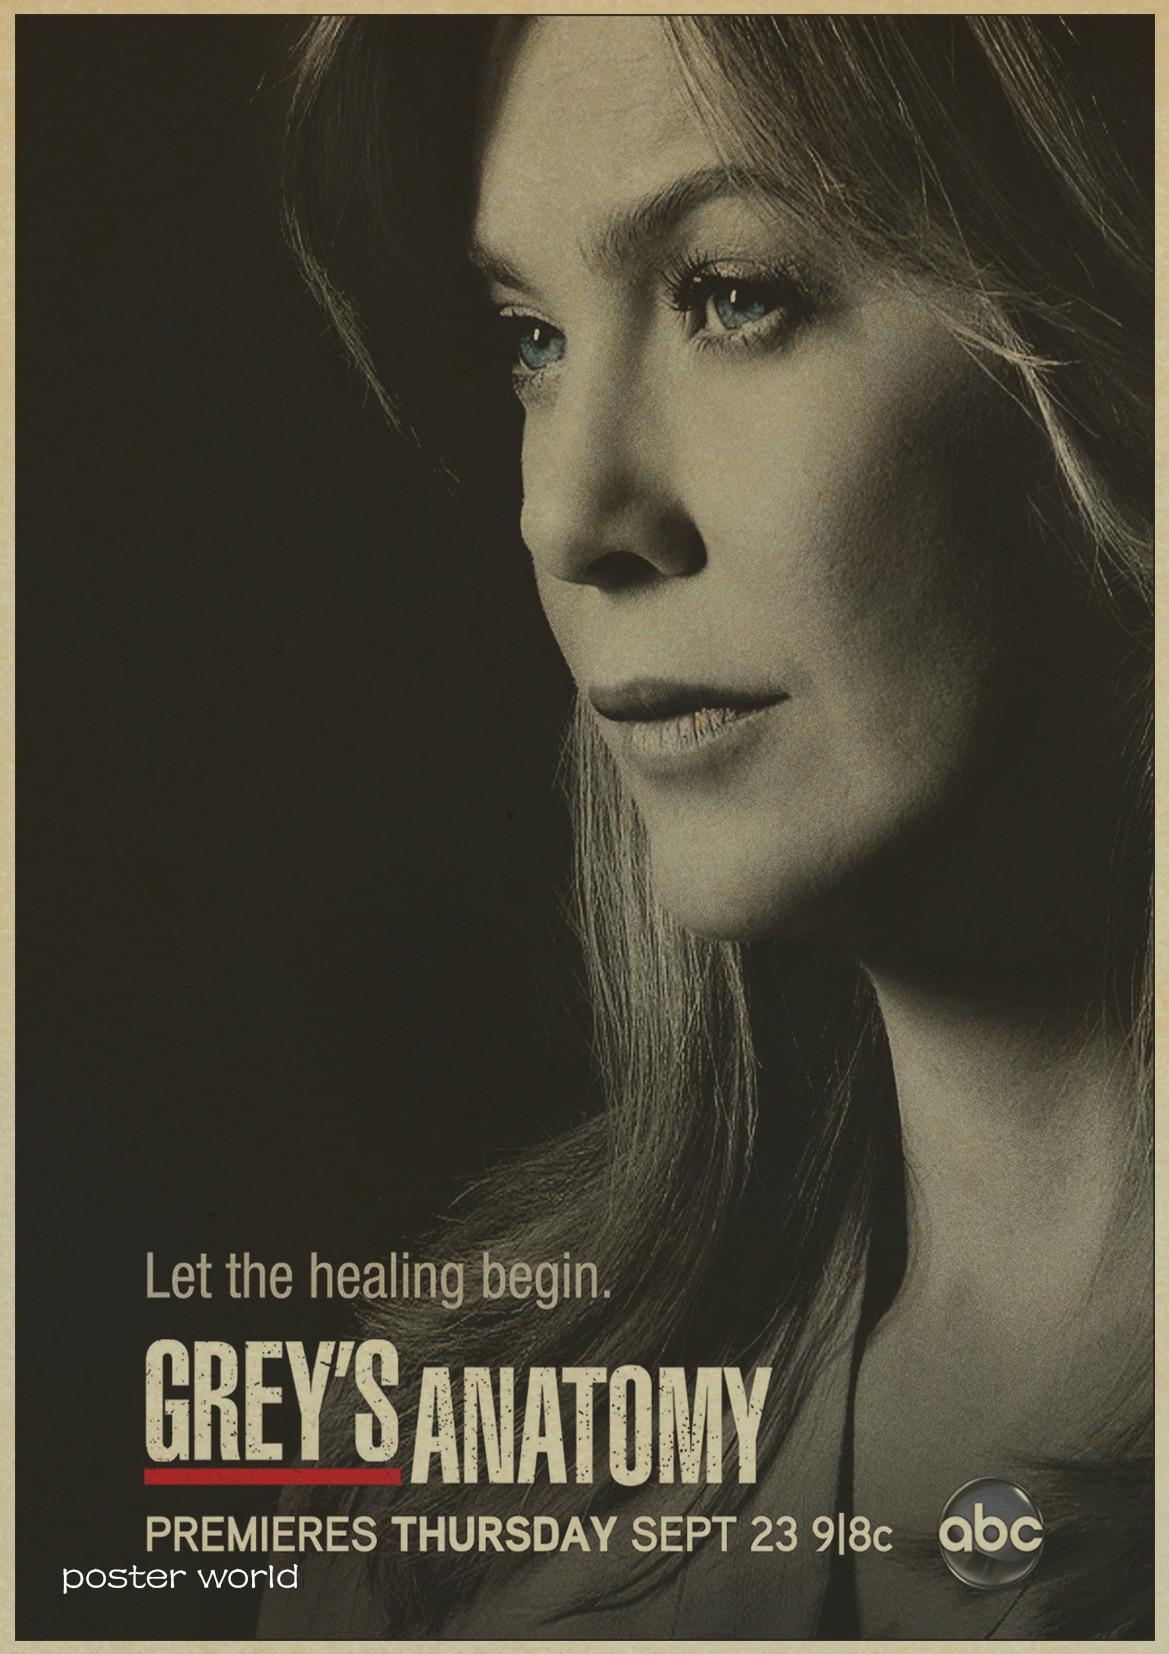 Greys Anatomy Operationen Beziehungen Komplikationen Tv Serie Kunst